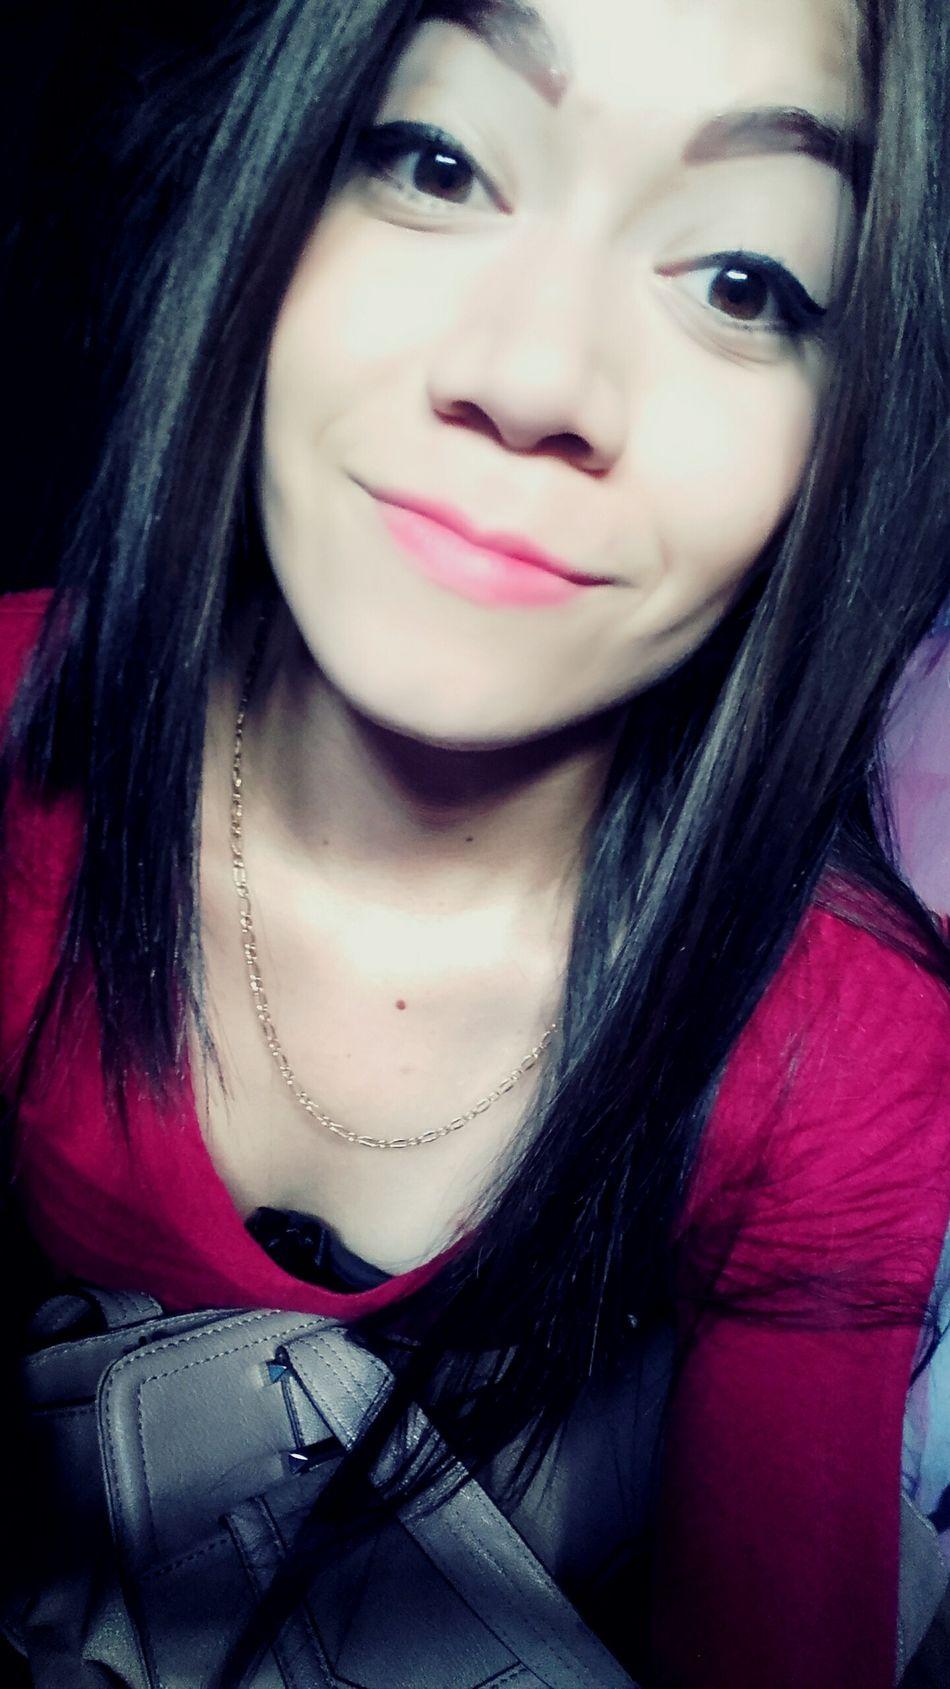 Salvadorean Girl♡ Selfietime That's Me Catita♡ Lovely My Eyes Cute♡ Hello World ✌ Taking Photos Pretty♡ Enormemente Feli! Hello WorldHey EyeEm GIRL❤️